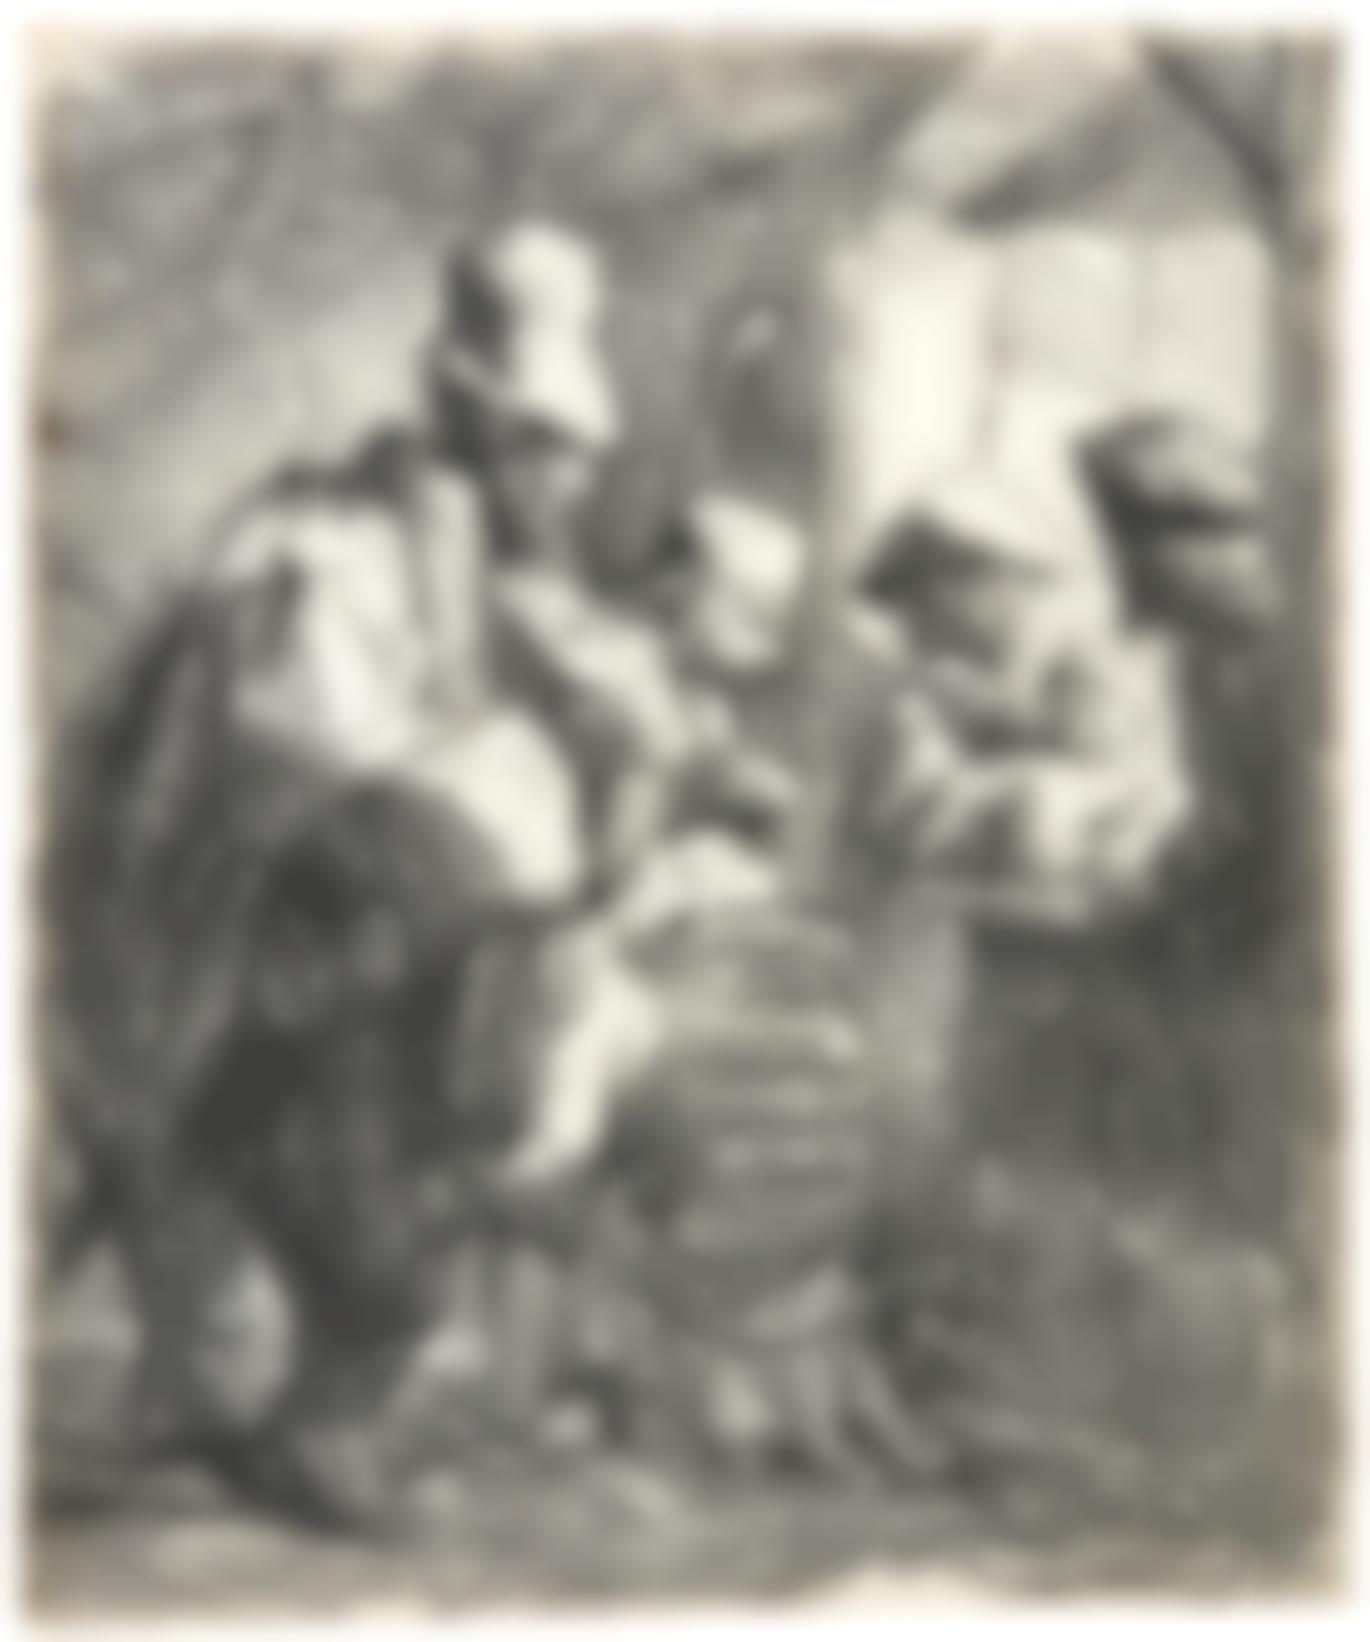 Rembrandt van Rijn-The Strolling Musicians (B., Holl. 119; New Holl. 141; H. 142)-1635